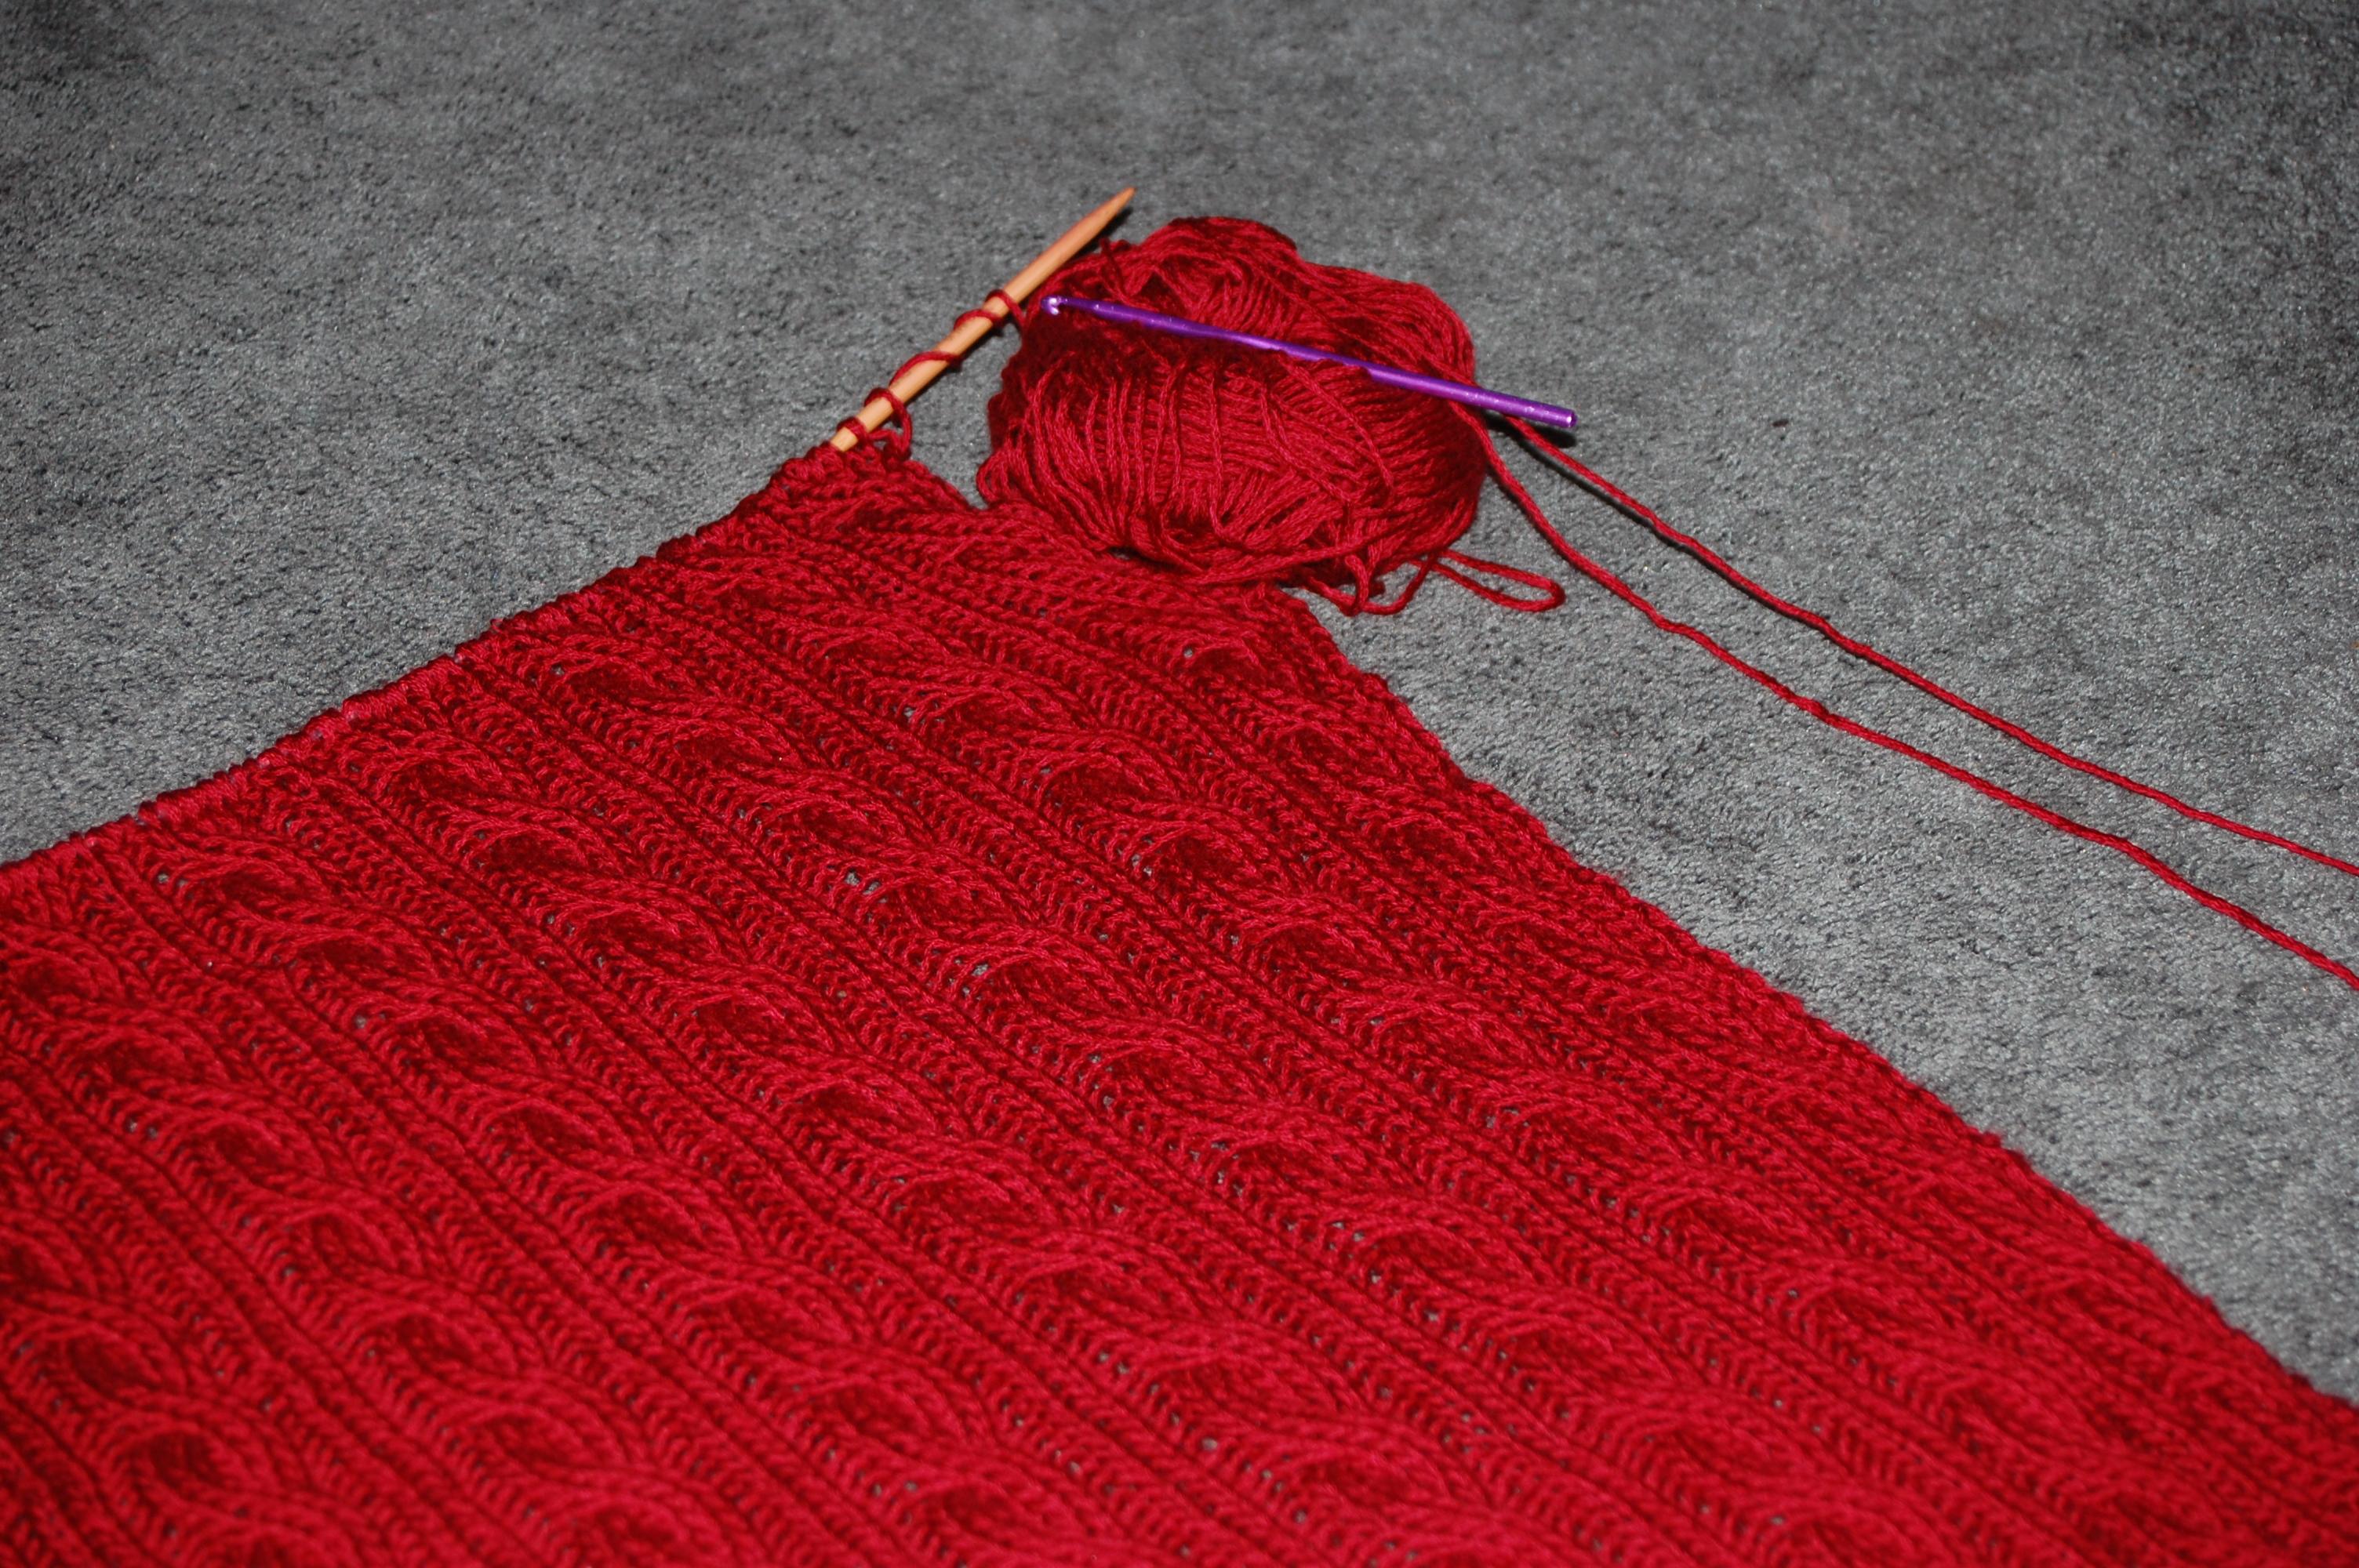 red-blanket-006